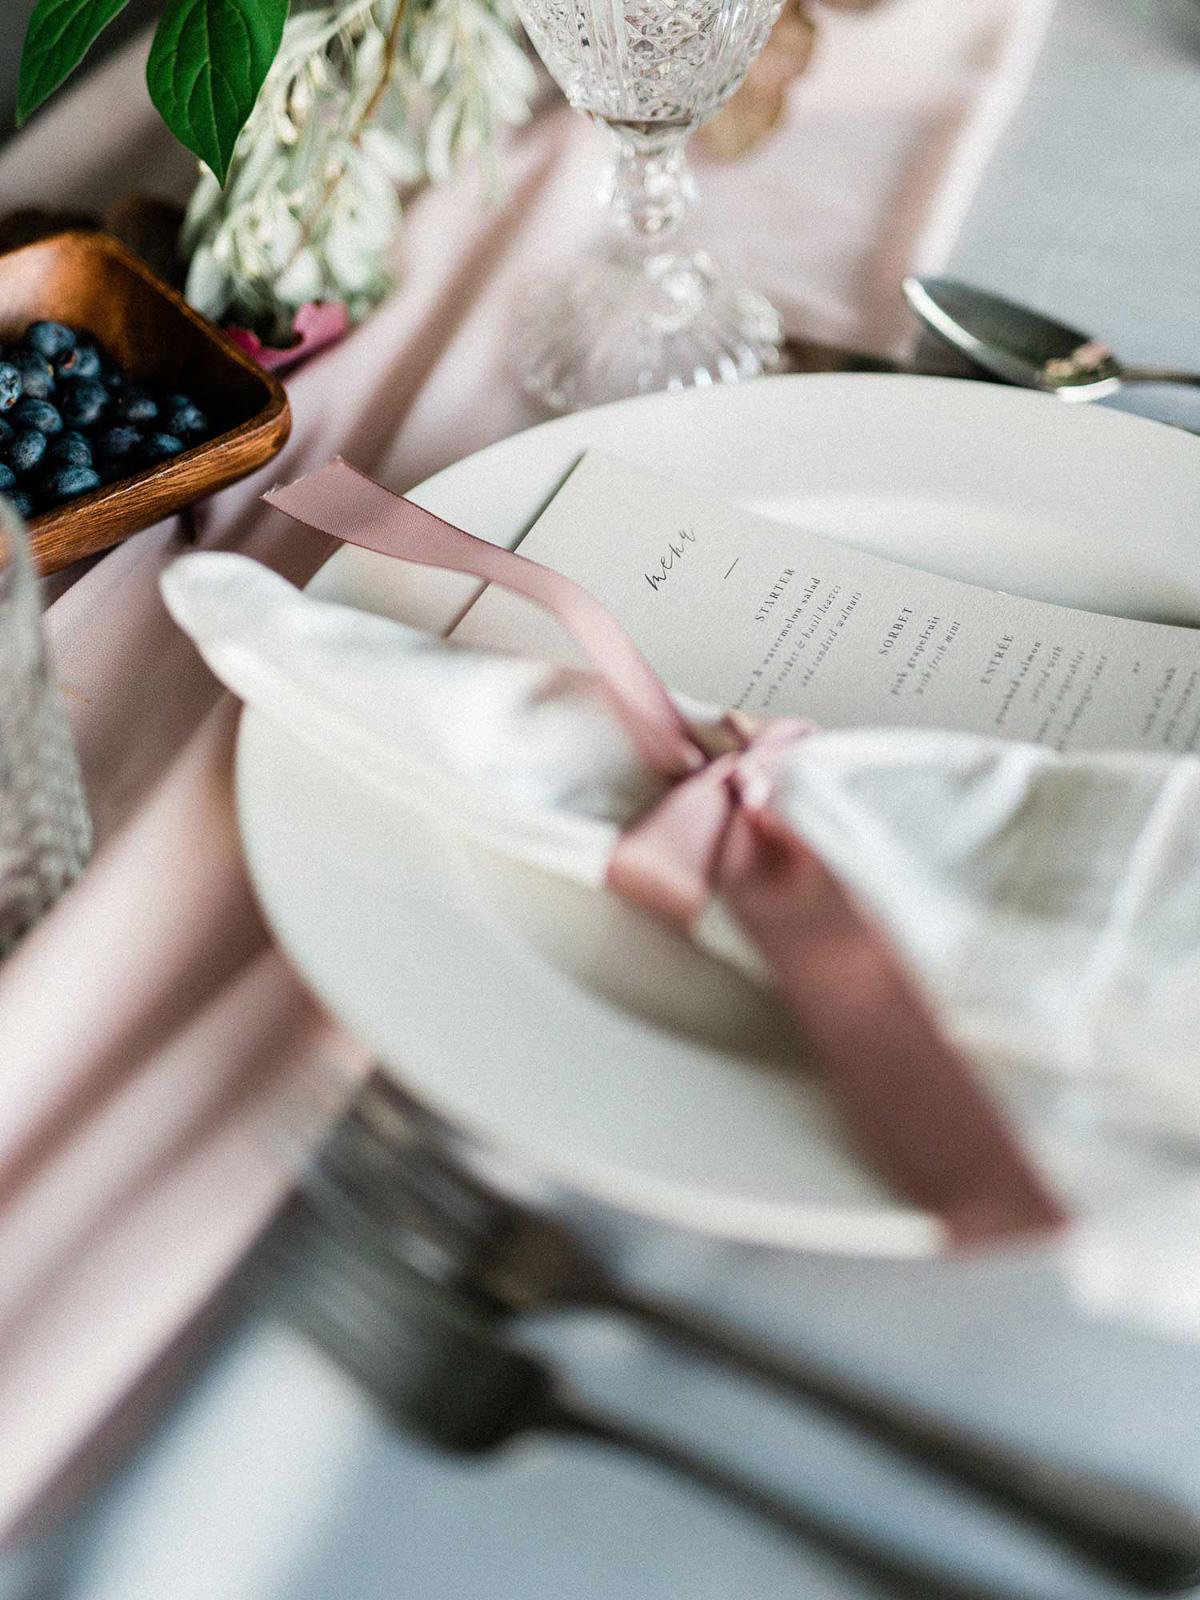 destiny-dawn-photography-vineyard-bride-swish-list-knollwood-golf-and-country-club-ancaster-wedding-editorial-40.jpg